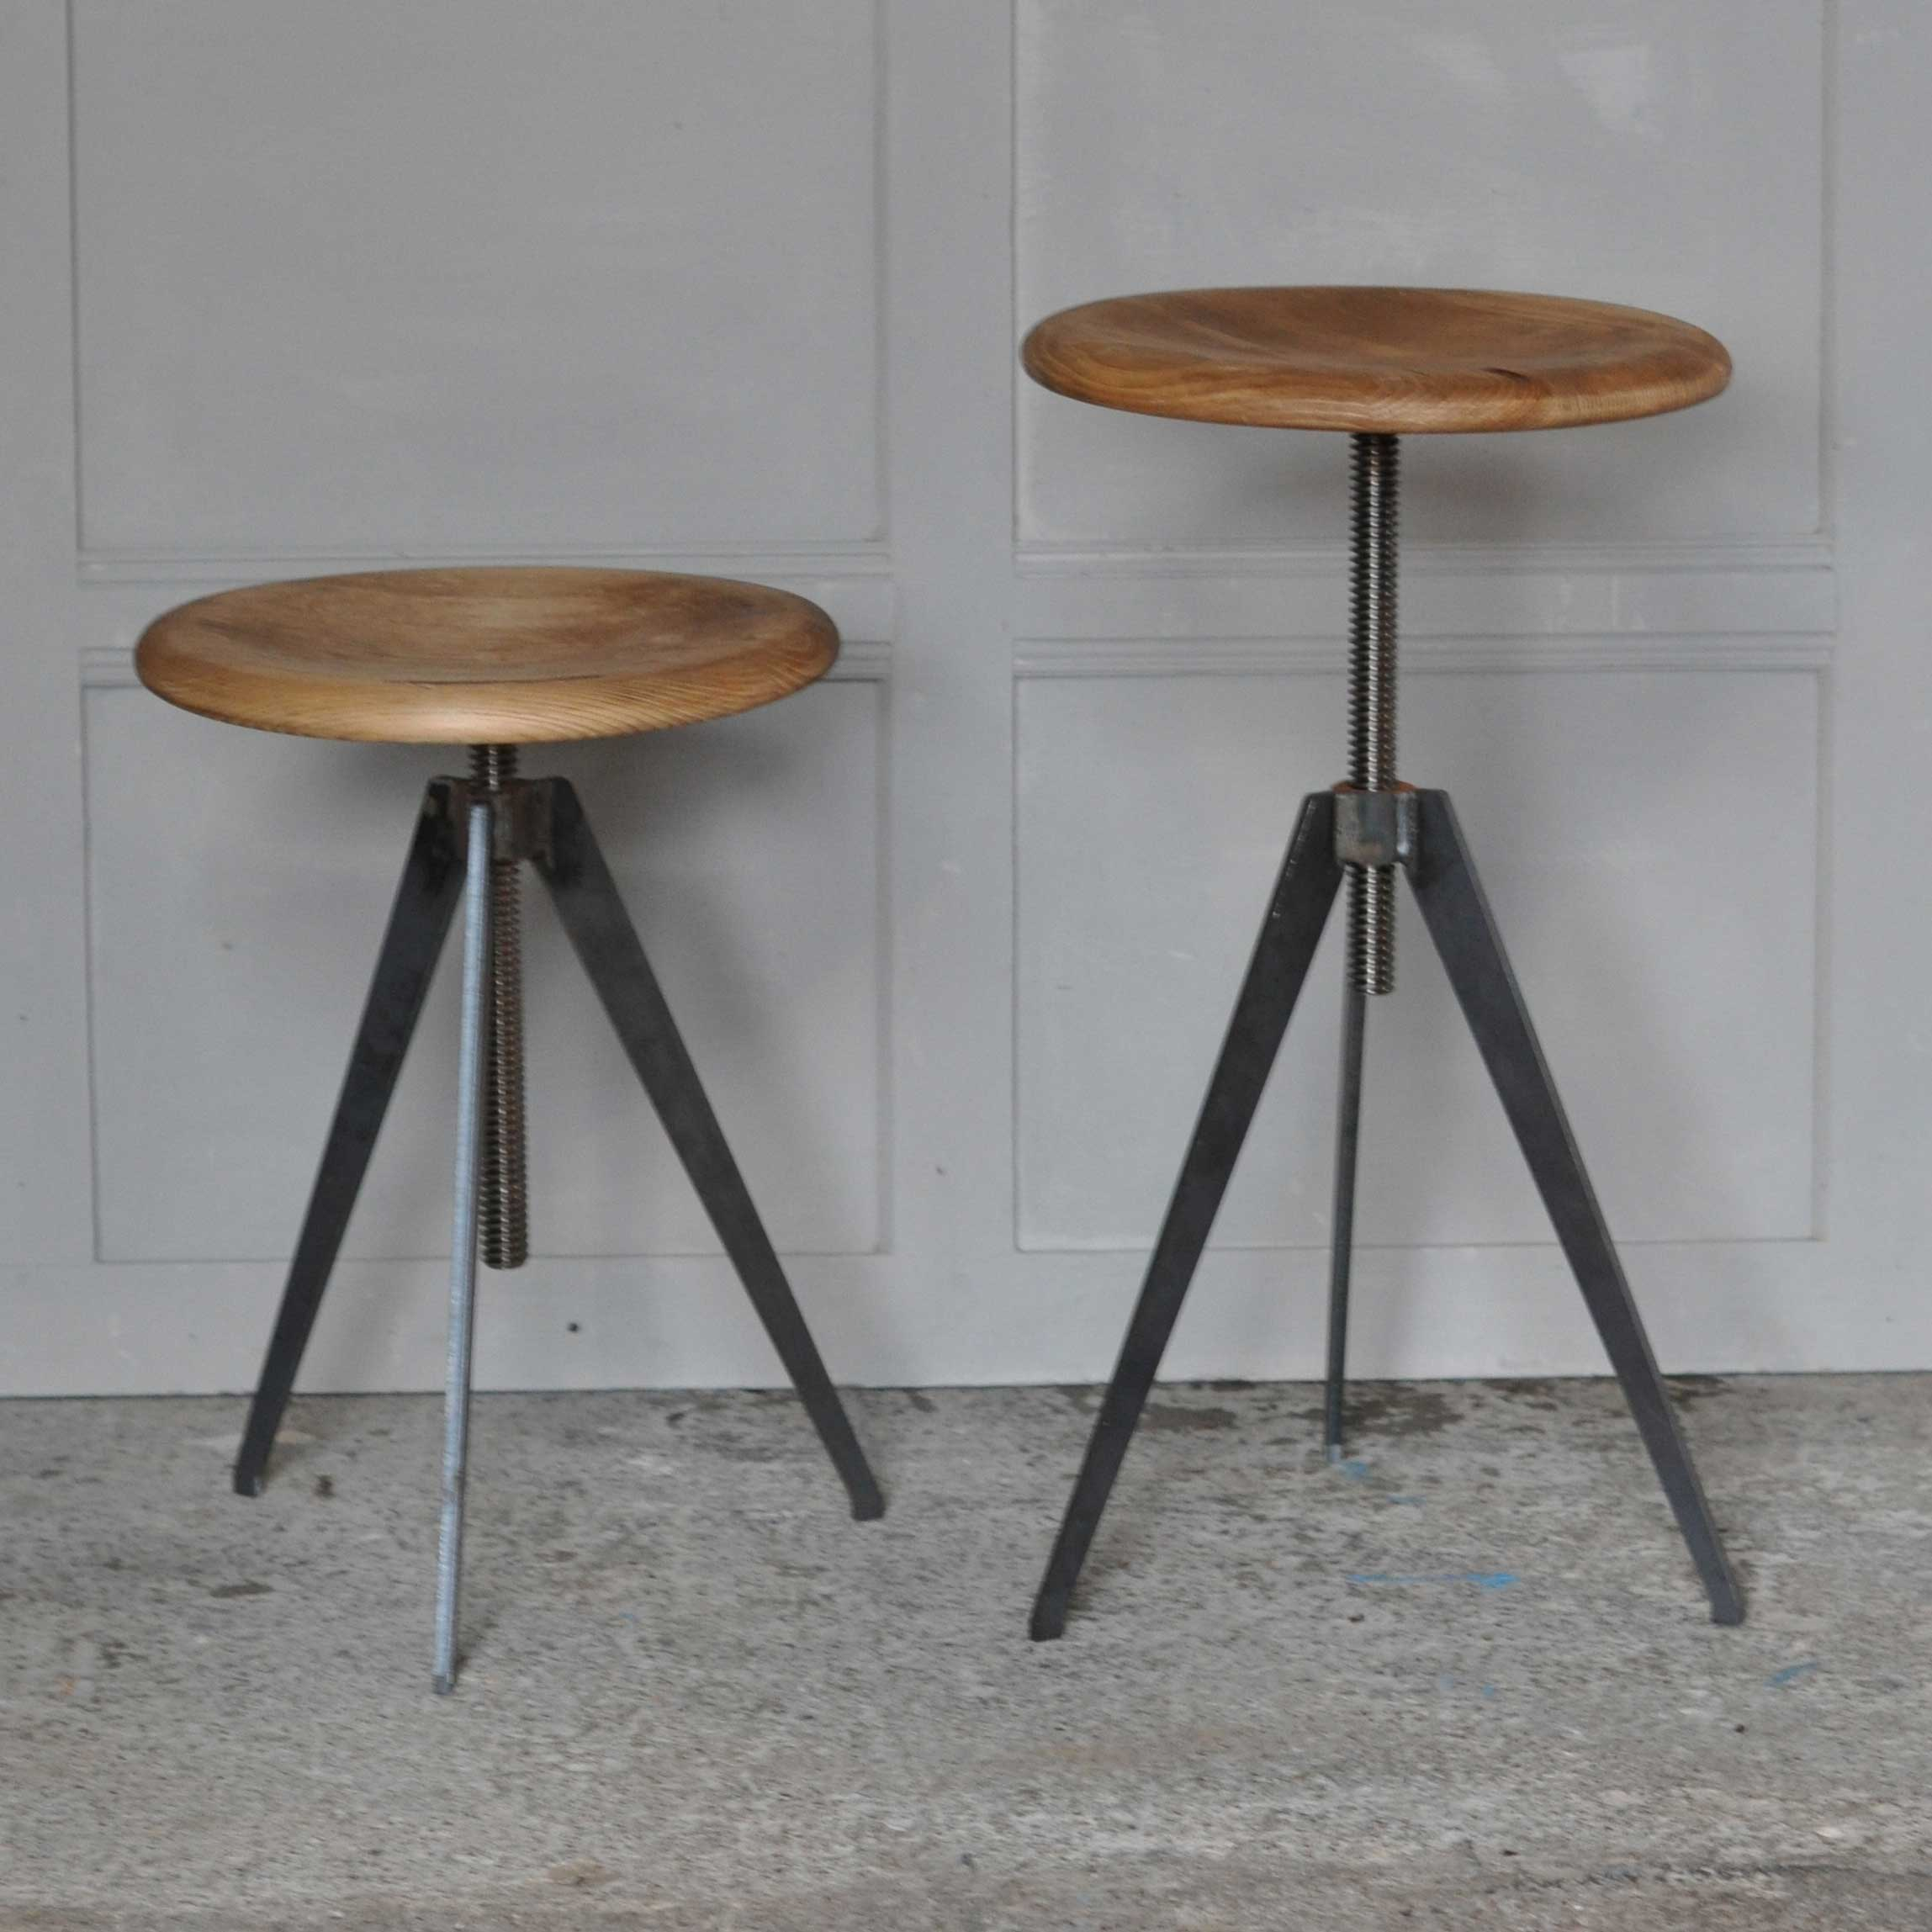 Industrial stool with wooden top adjustable screw